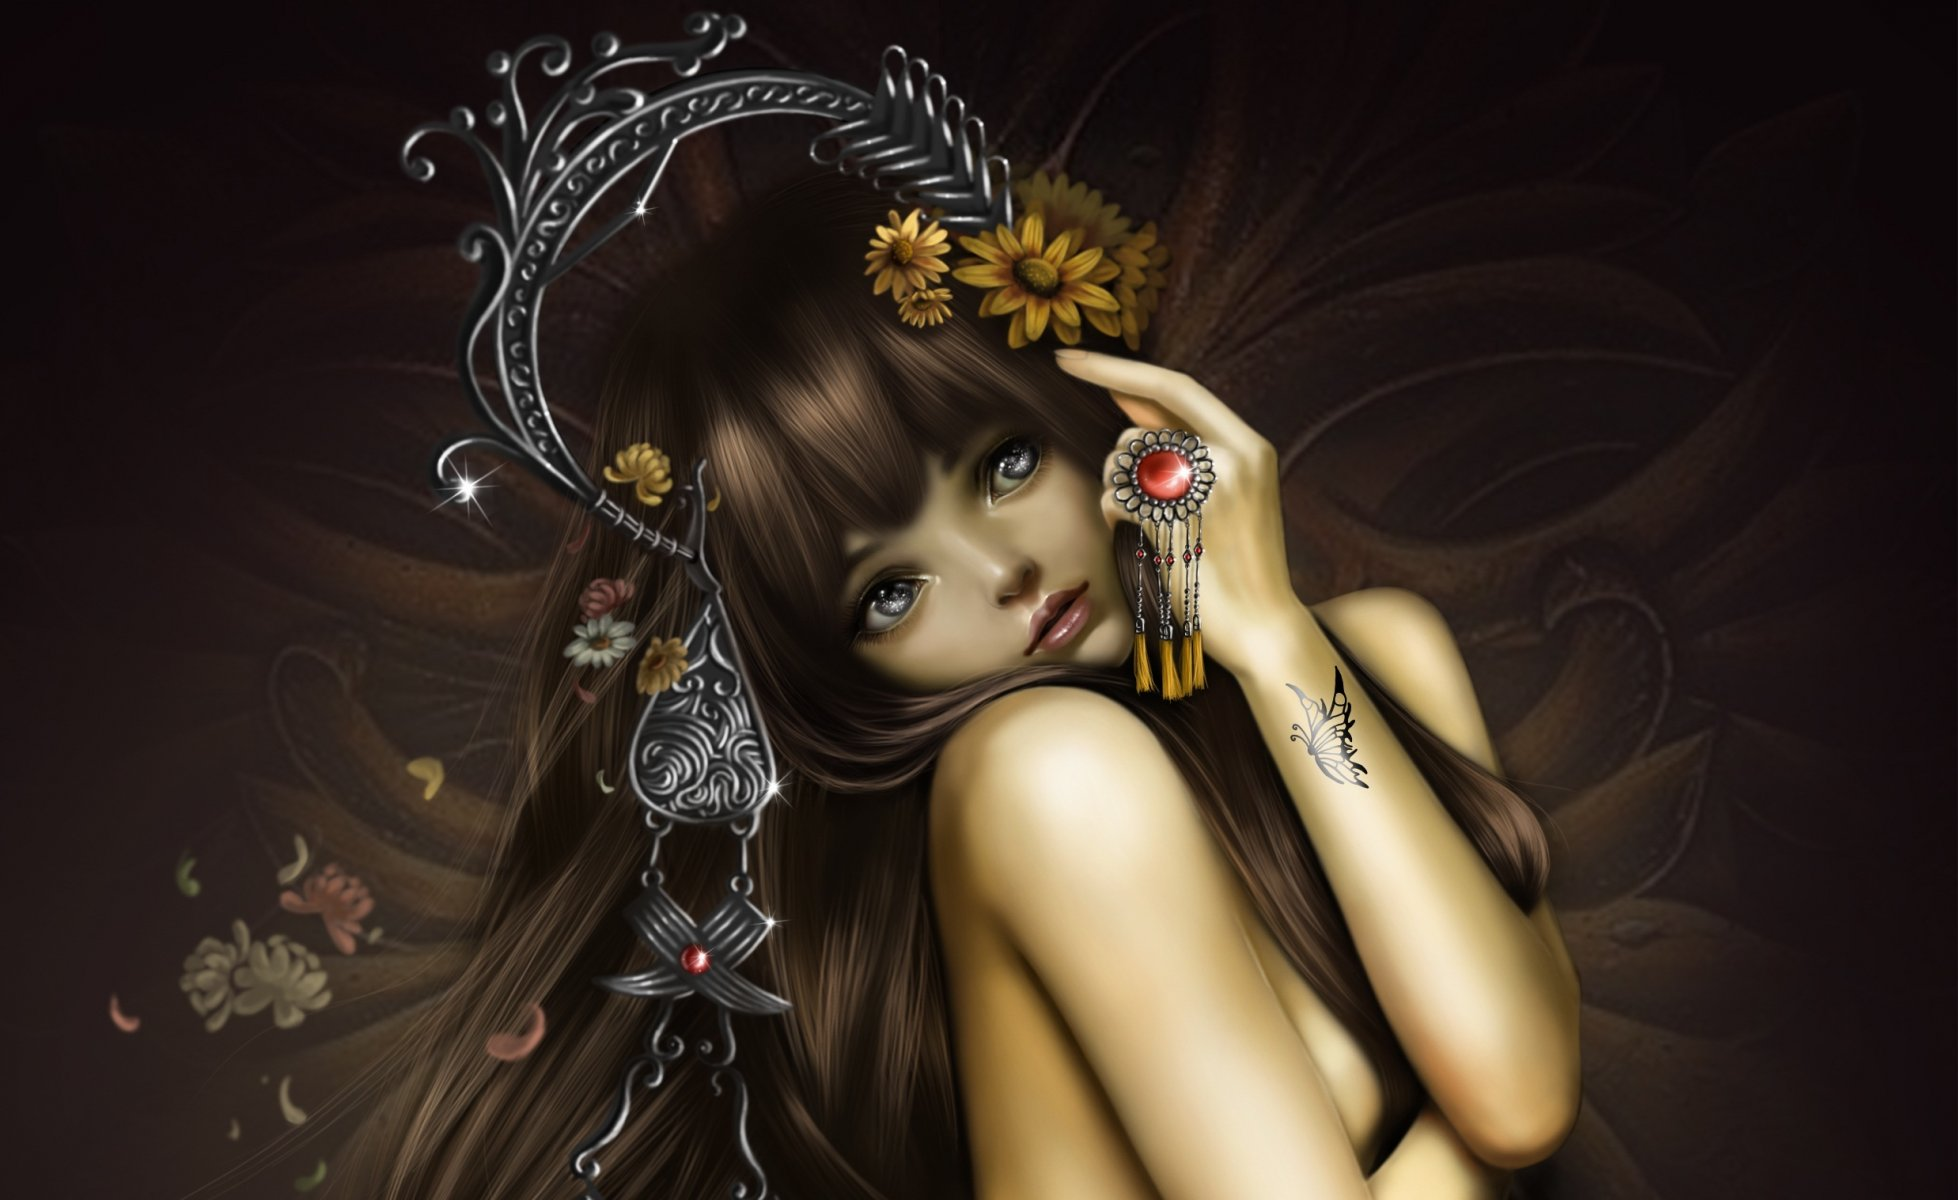 Girl hanged fantasy hentia videos